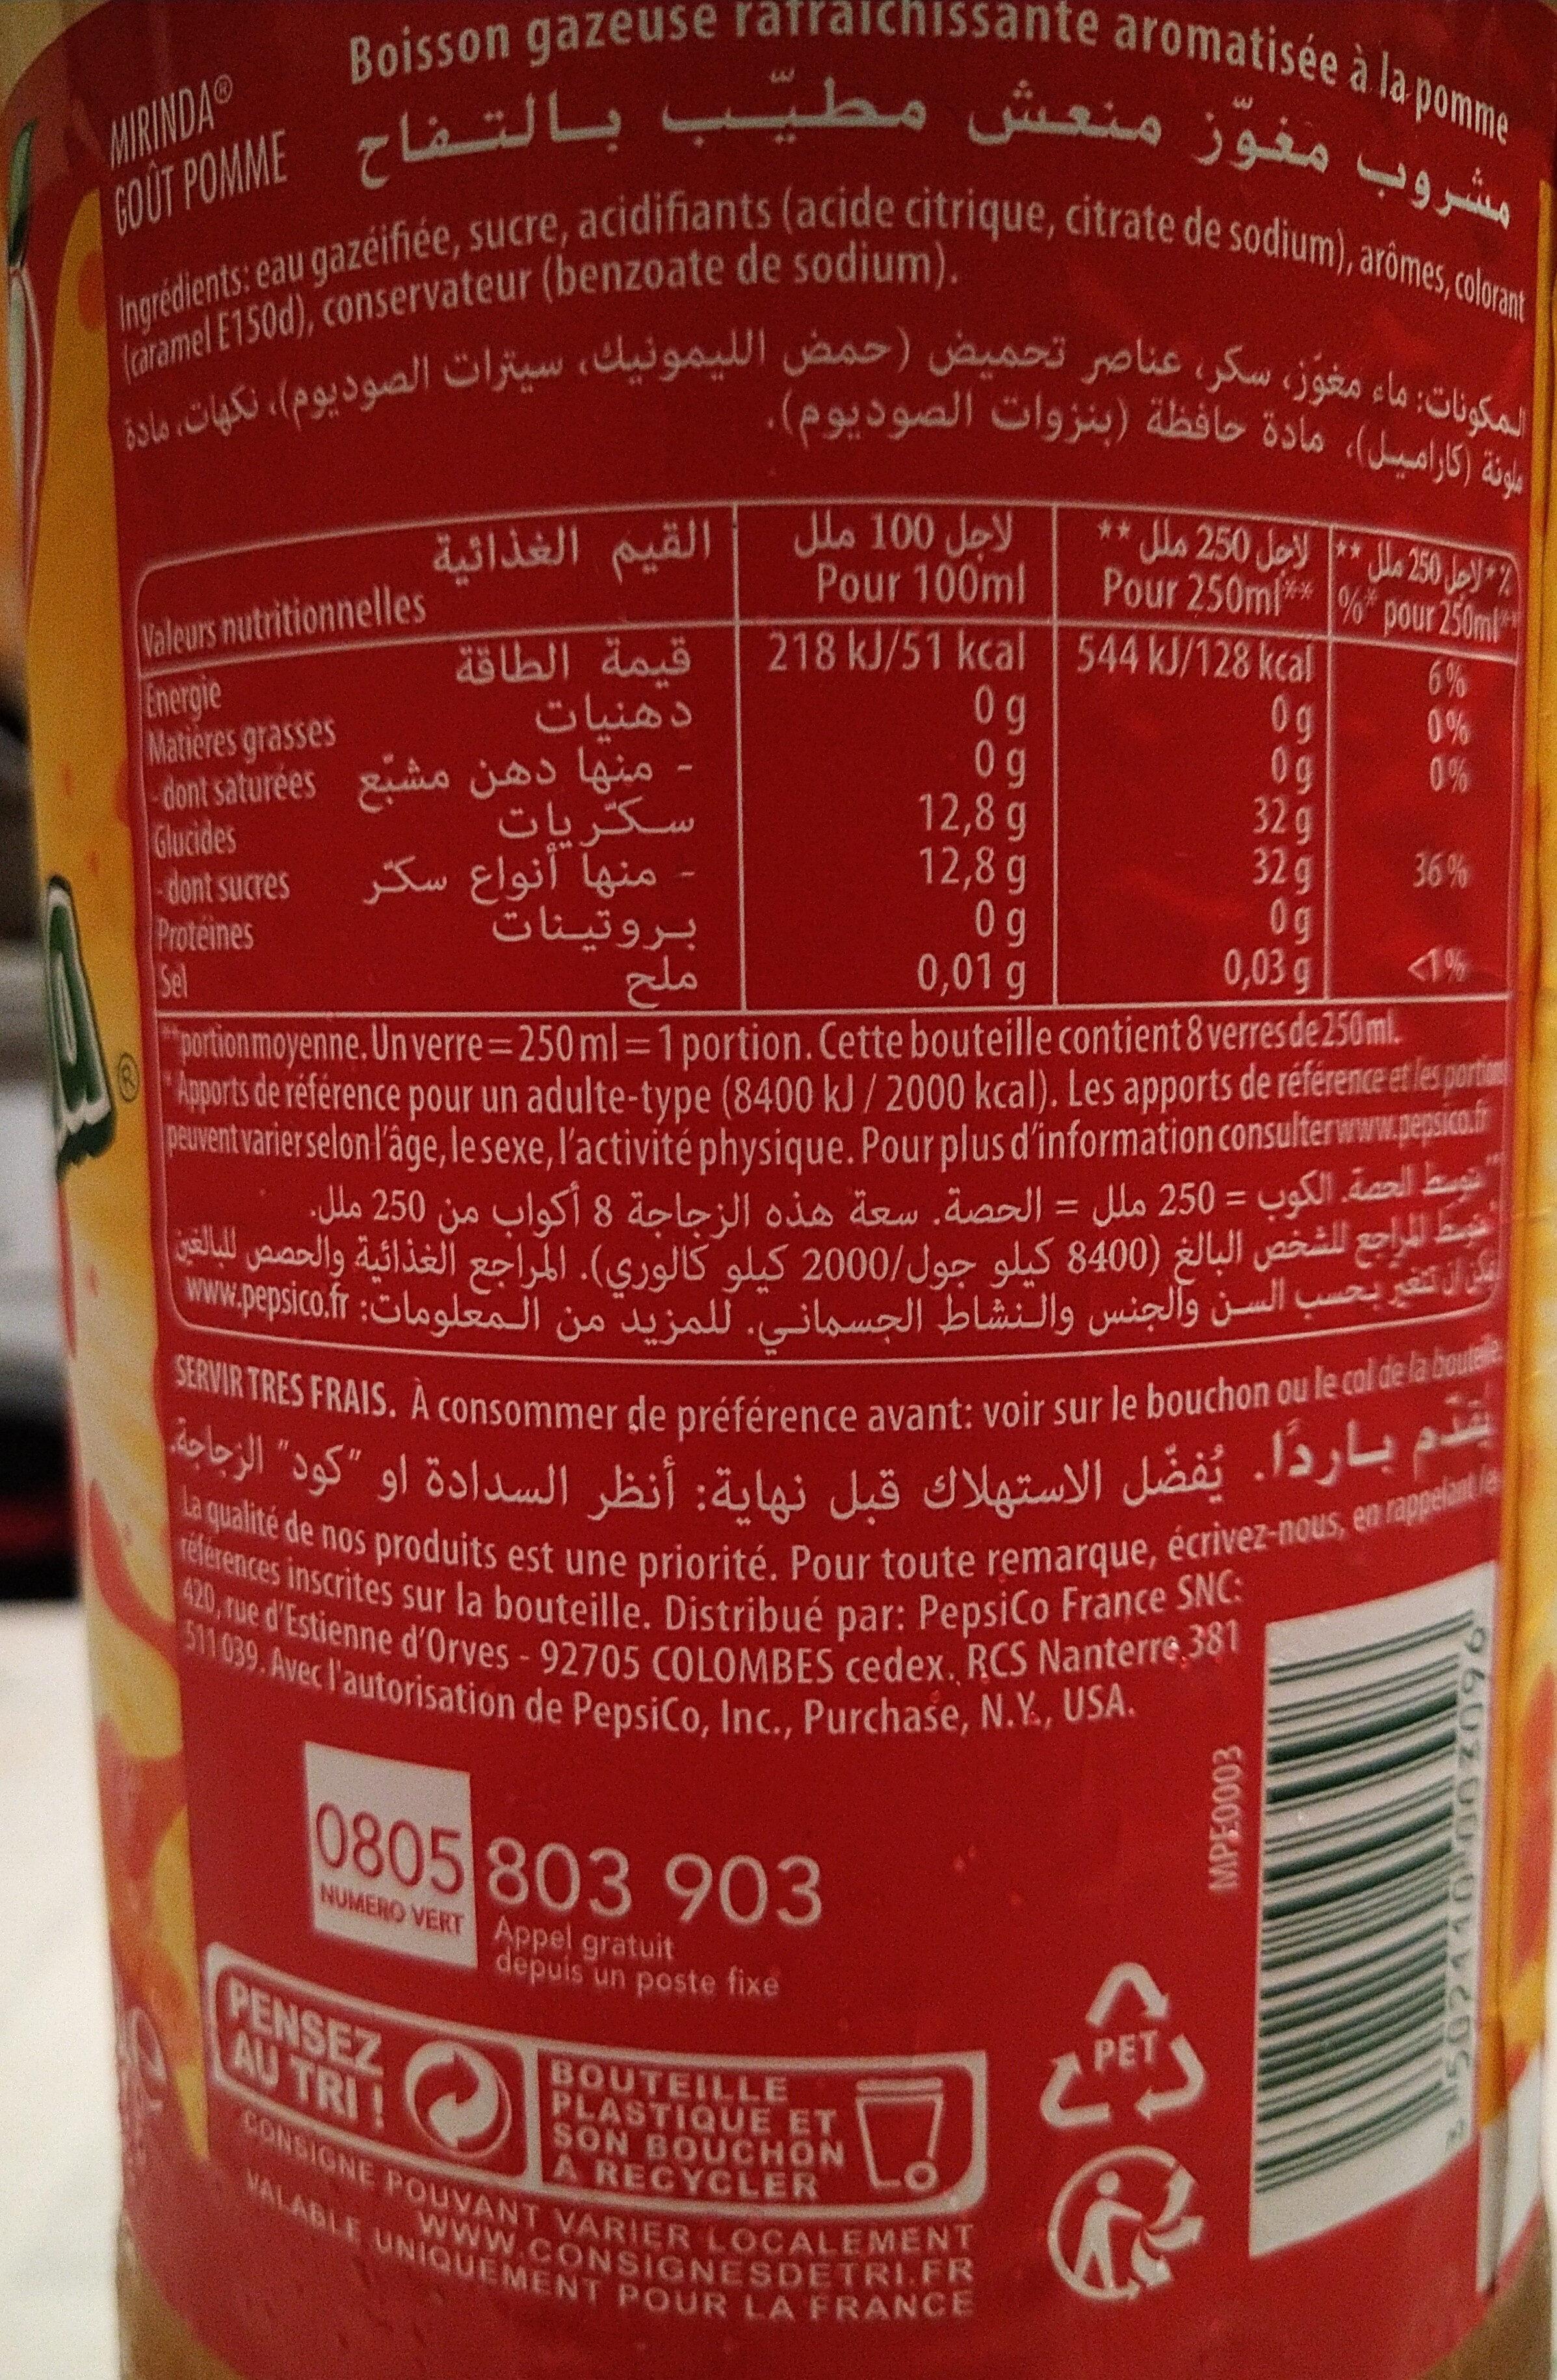 Mirinda Boisson gazeuse goût pomme 2 L - Informations nutritionnelles - fr